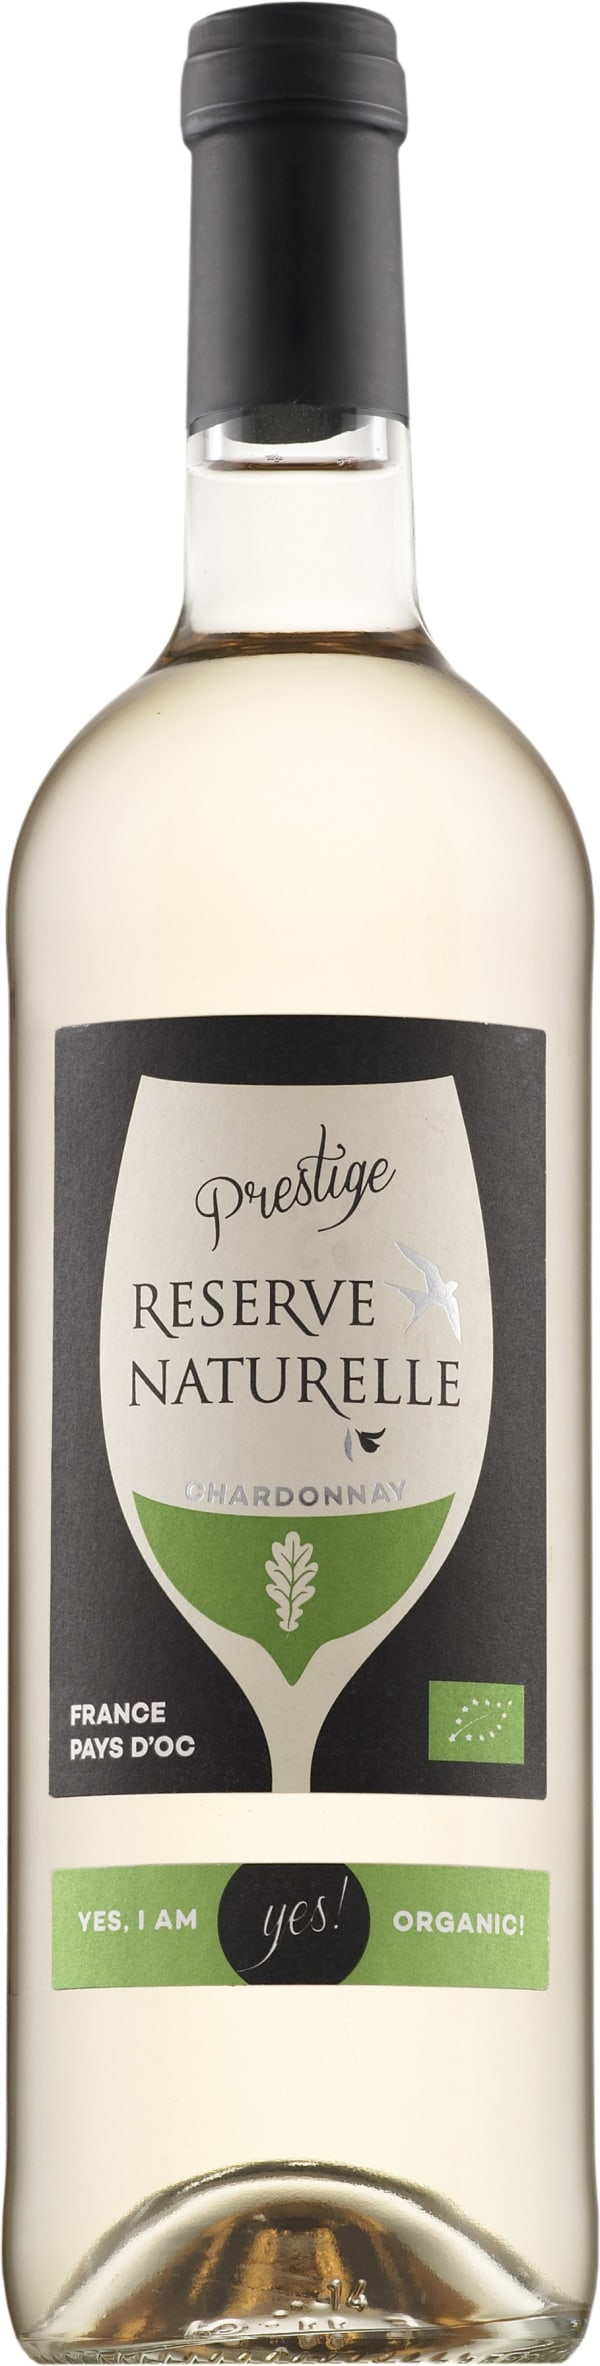 Reserve Naturelle Prestige Chardonnay 2015